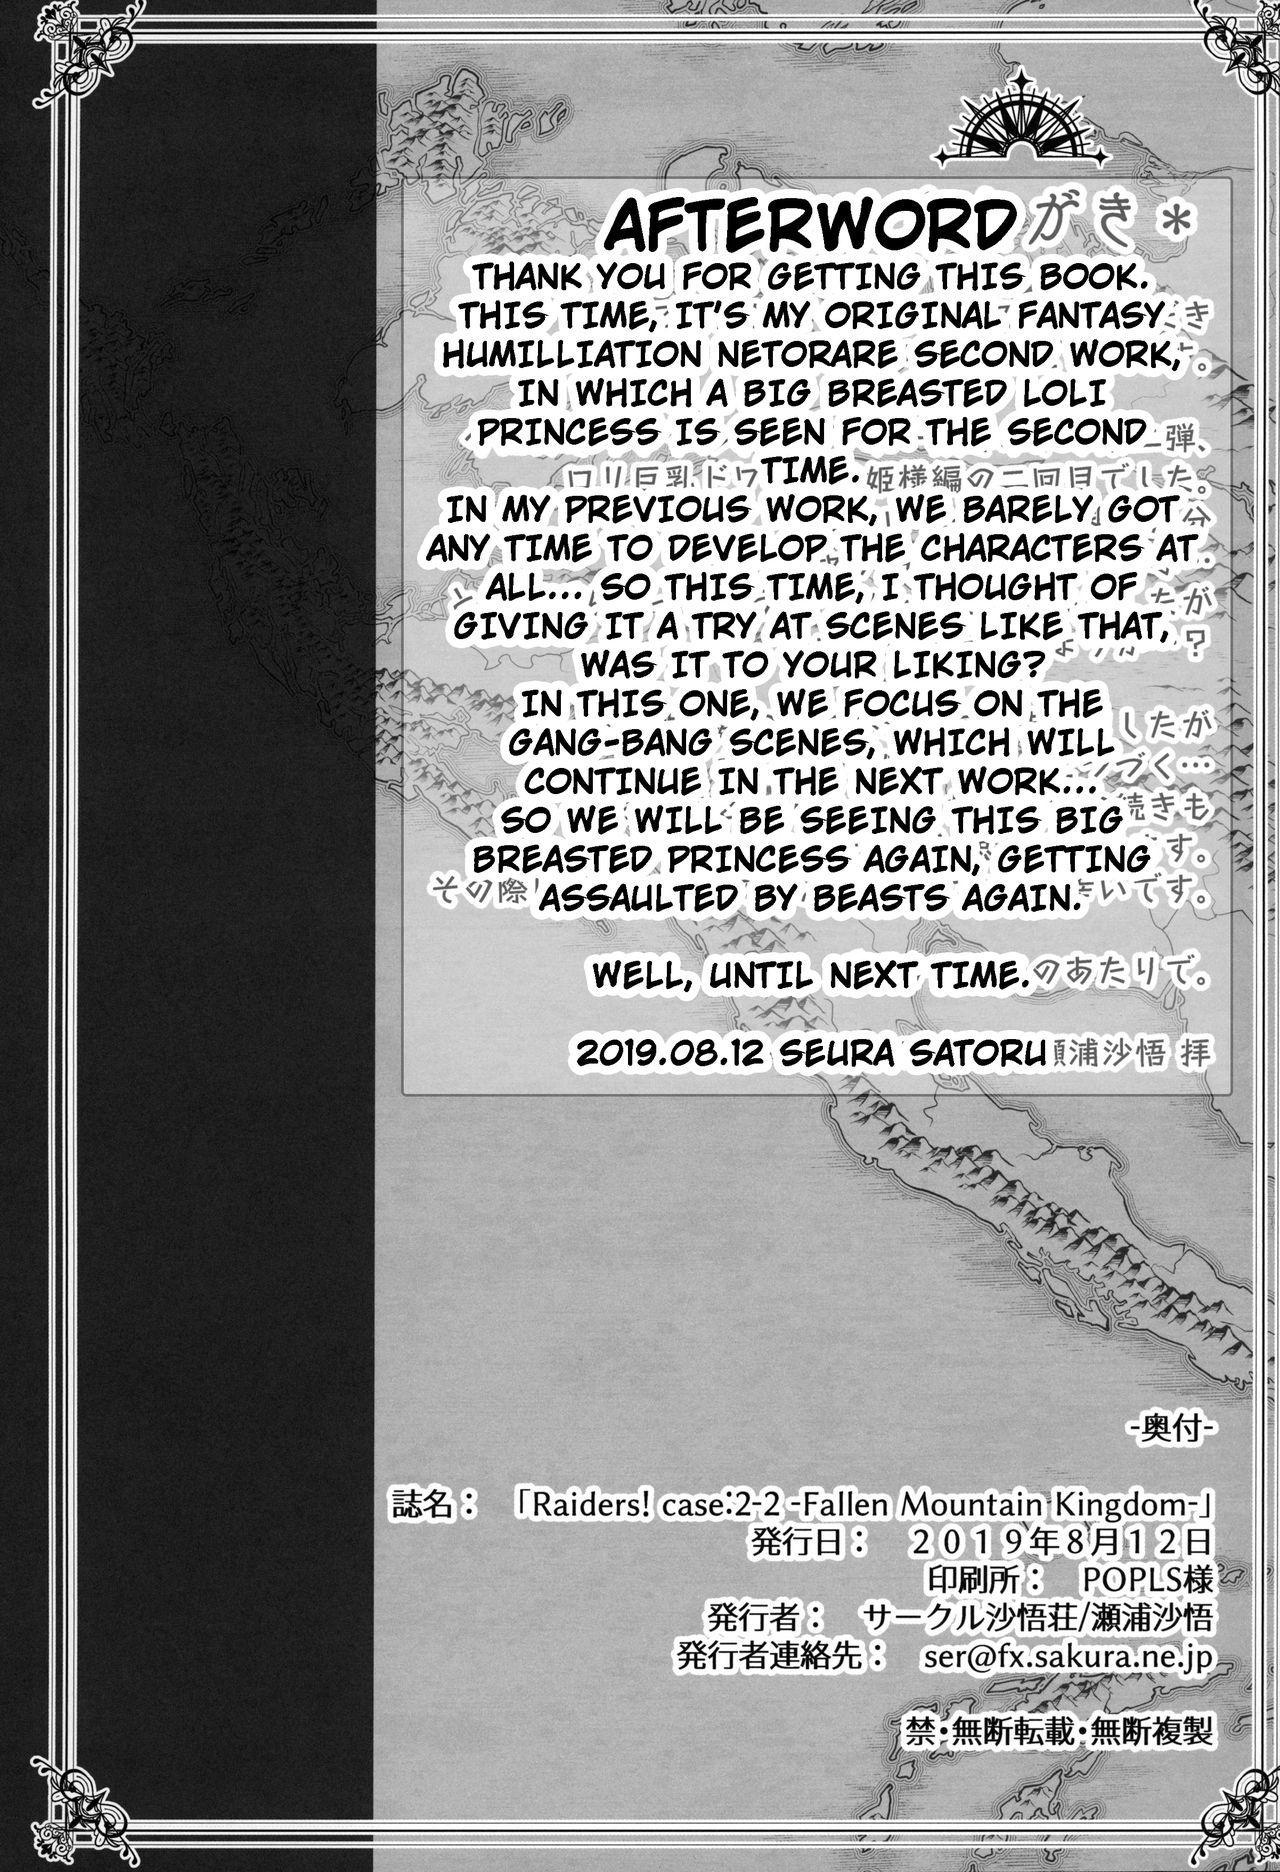 (C96) [Sago-Jou (Seura Isago)] Raiders! case:2-2 -Fallen Mountain Kingdom- [English] [PHILO] 40